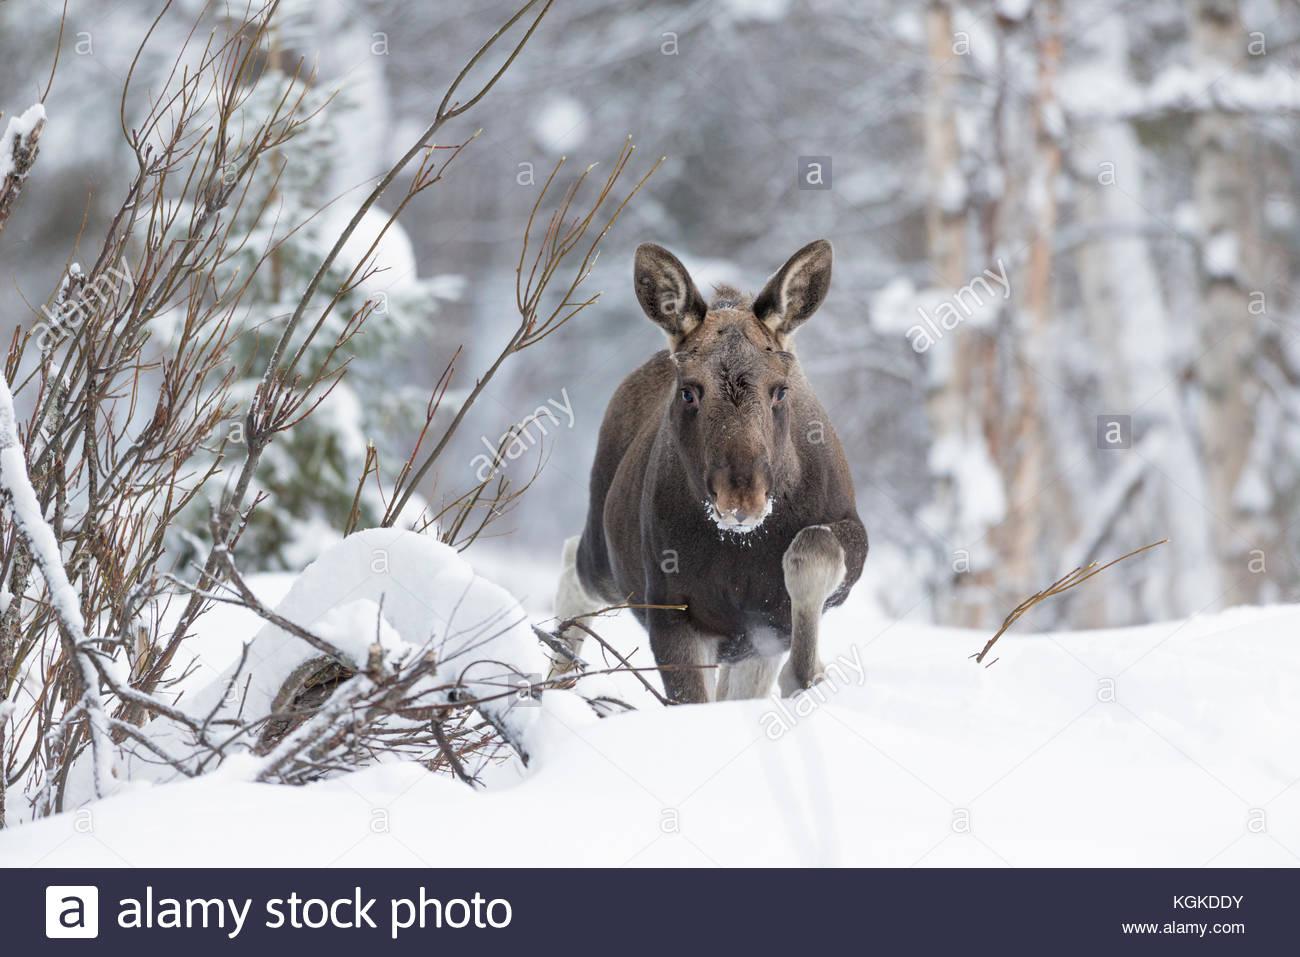 European elk, Alces alces, walking in snow. - Stock Image